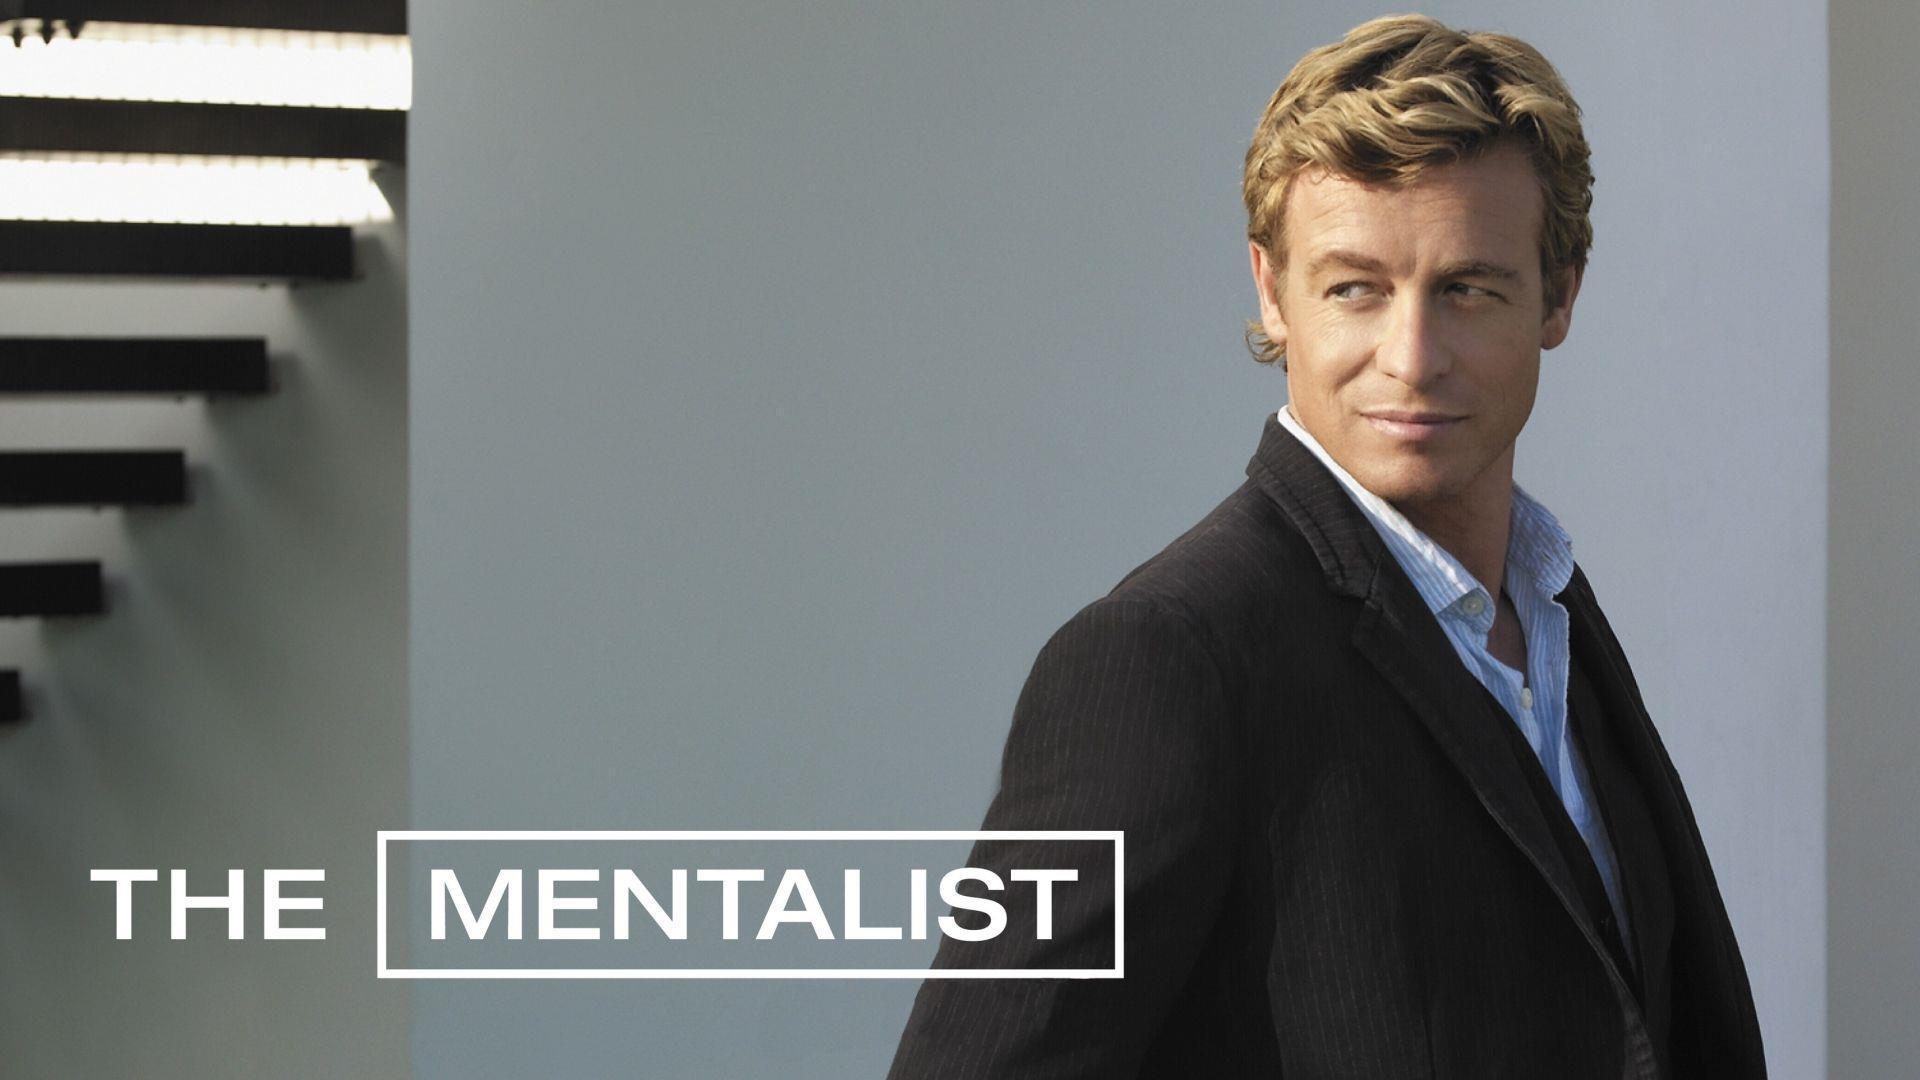 The Mentalist (serial) 732253